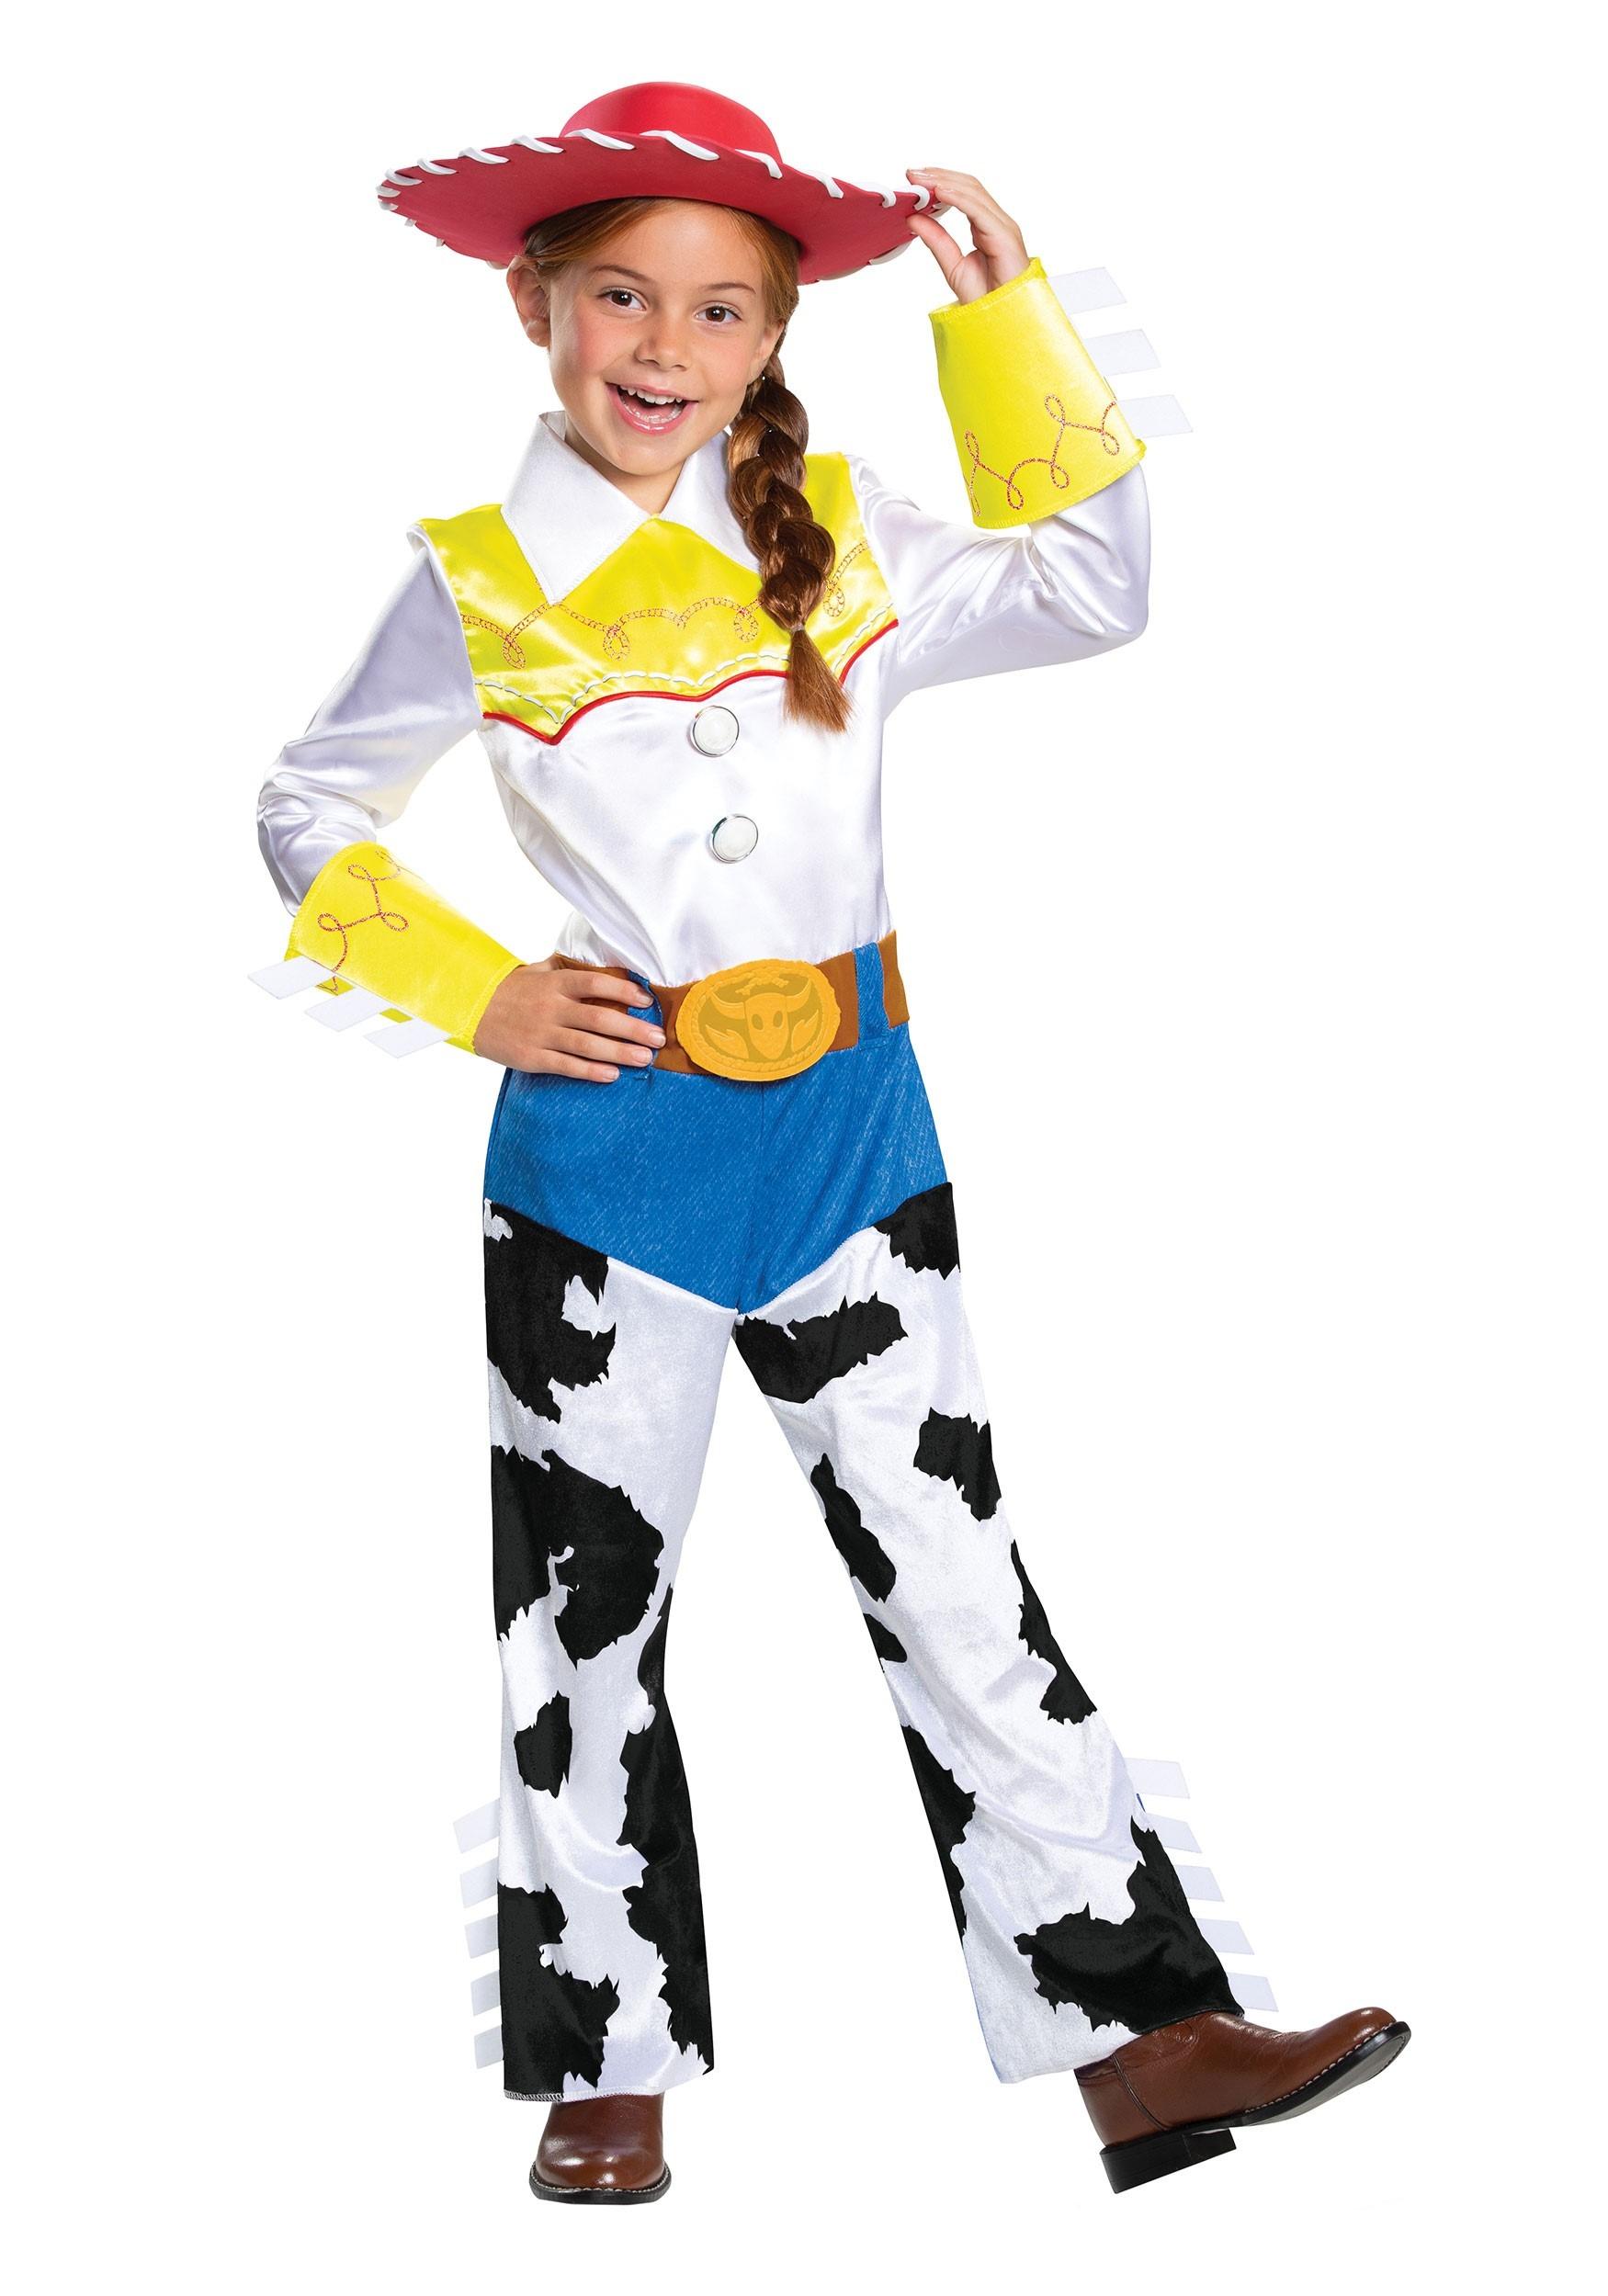 Toy Story 4 Jessie Costume No Hat